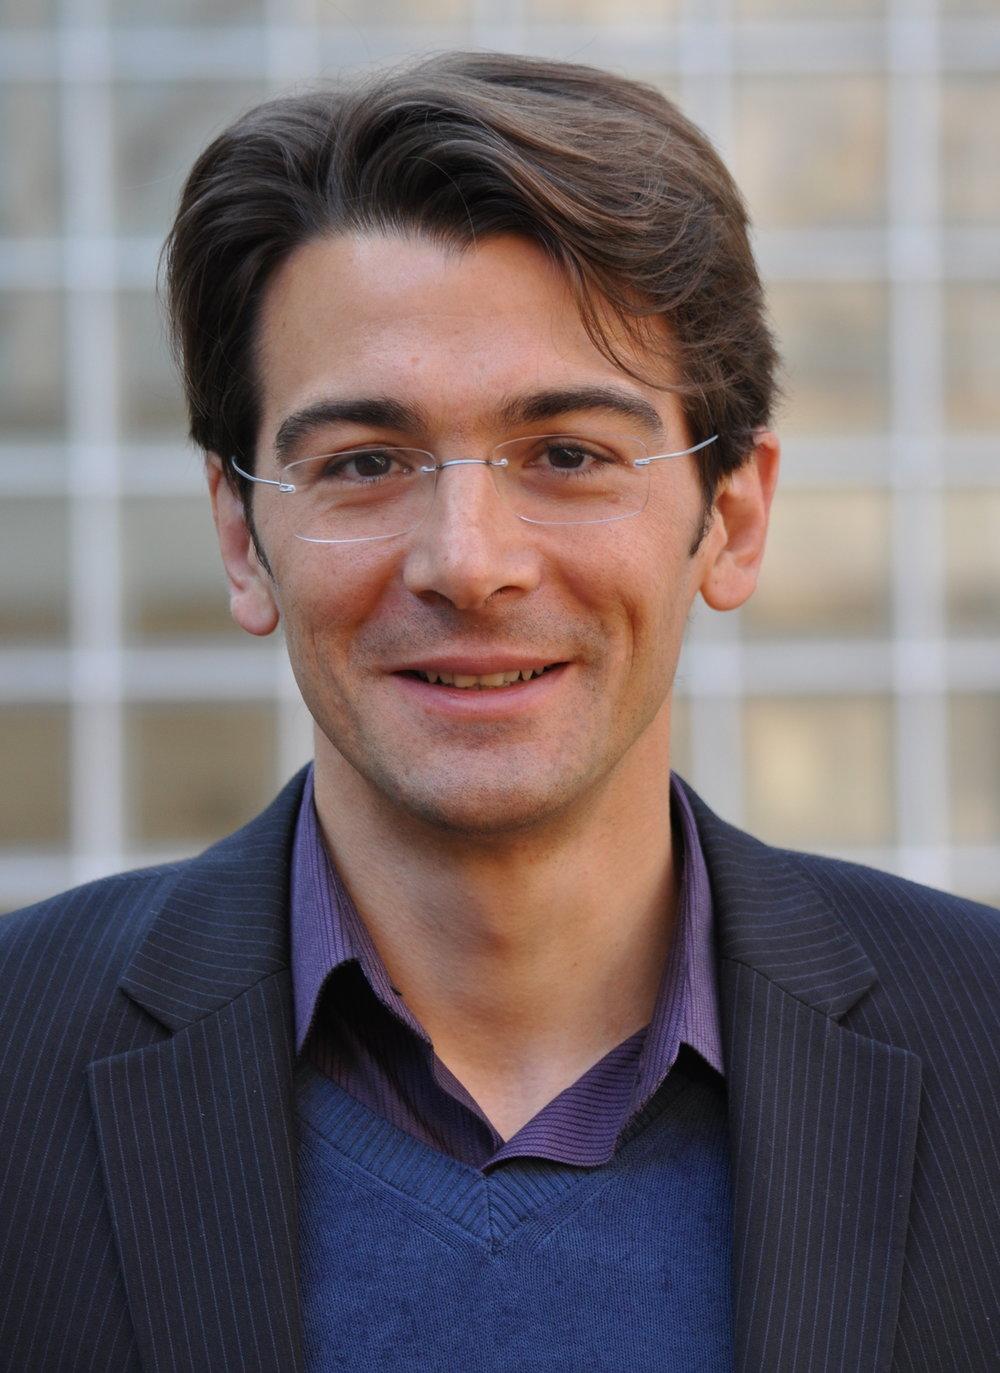 Session 4 - François Carrillat